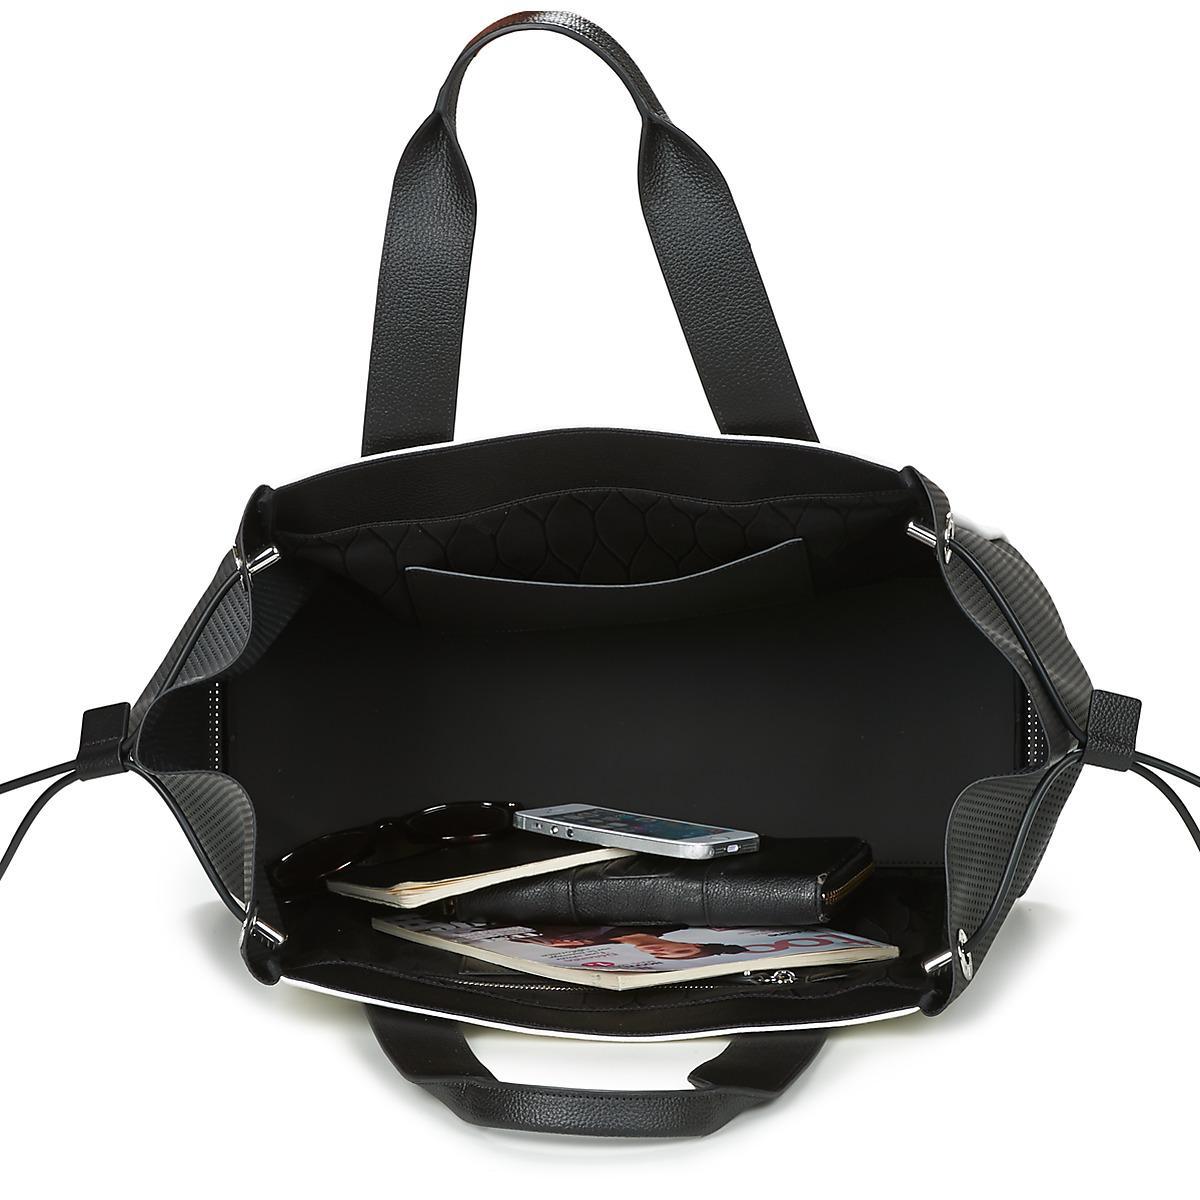 KENZO Kanvas Tote Large Bag Women's Shopper Bag In Black